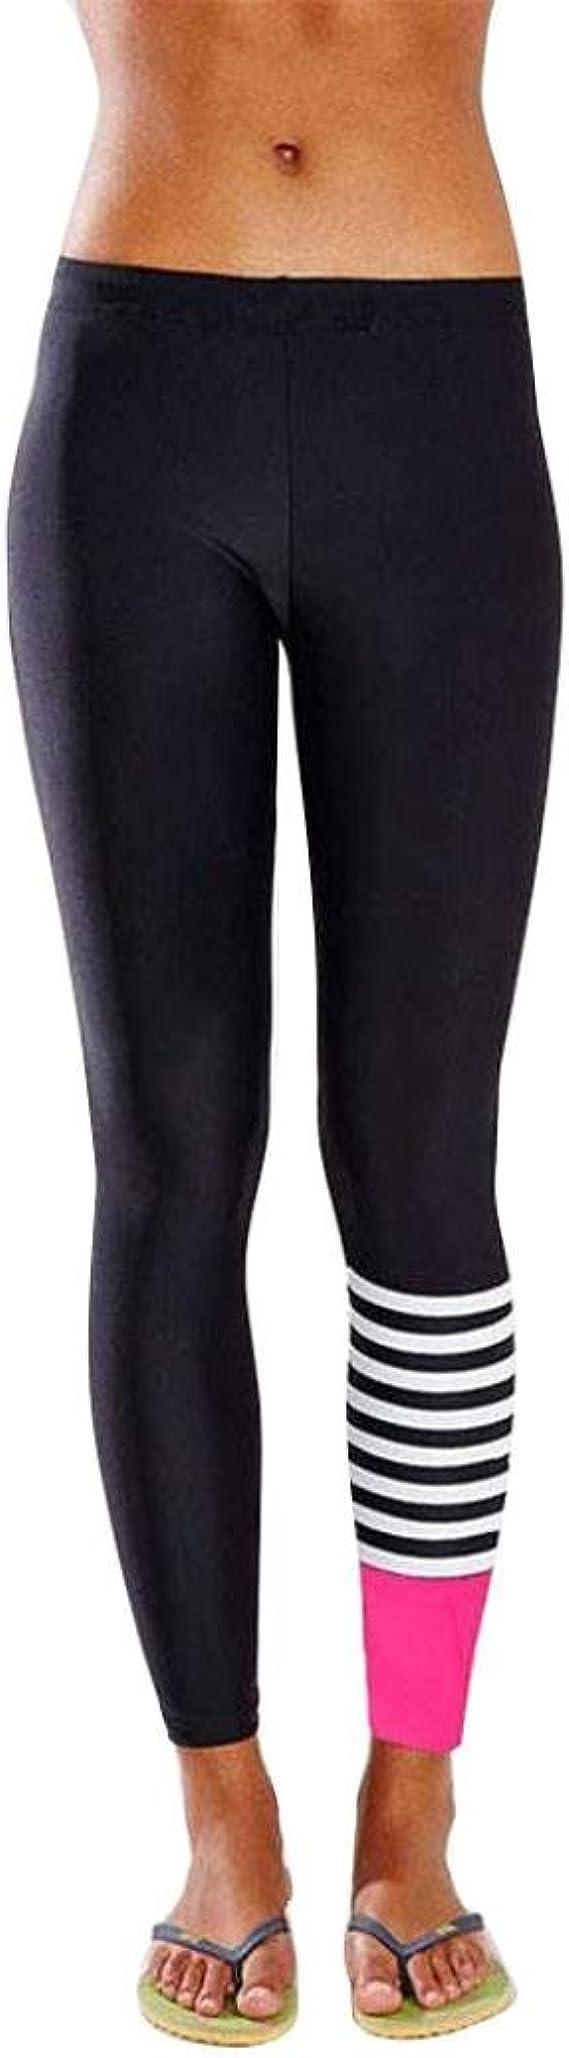 Fashion Fleece Lined FAIRISLE PRINT BRUSH LEGGINGS Women Stretch Skinny Pants